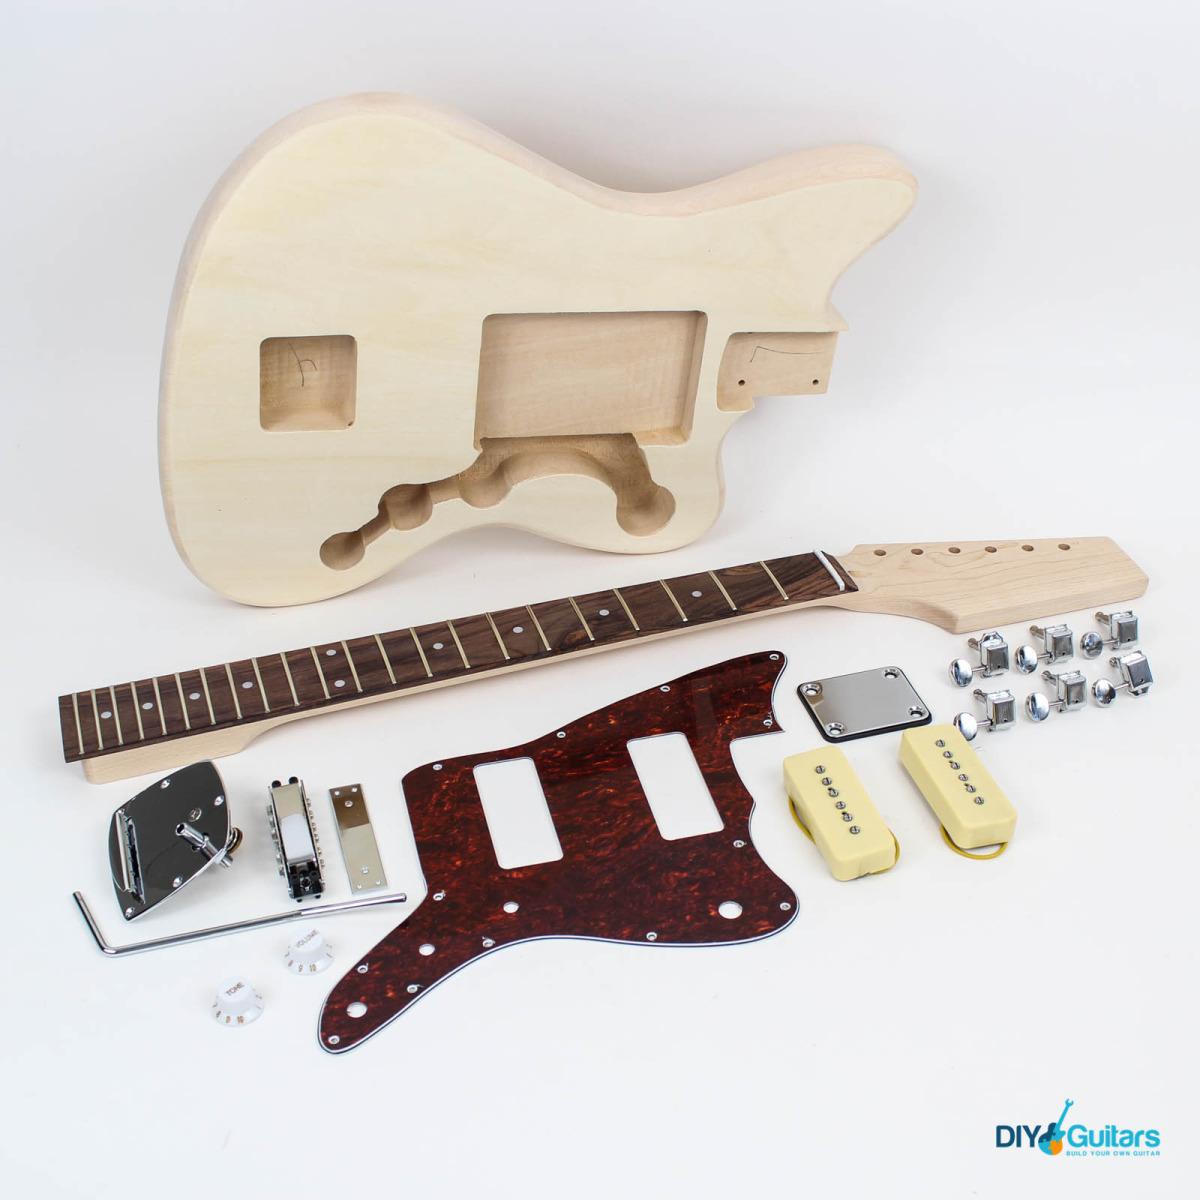 Jazzmaster Style Guitar Kit Diy Guitars